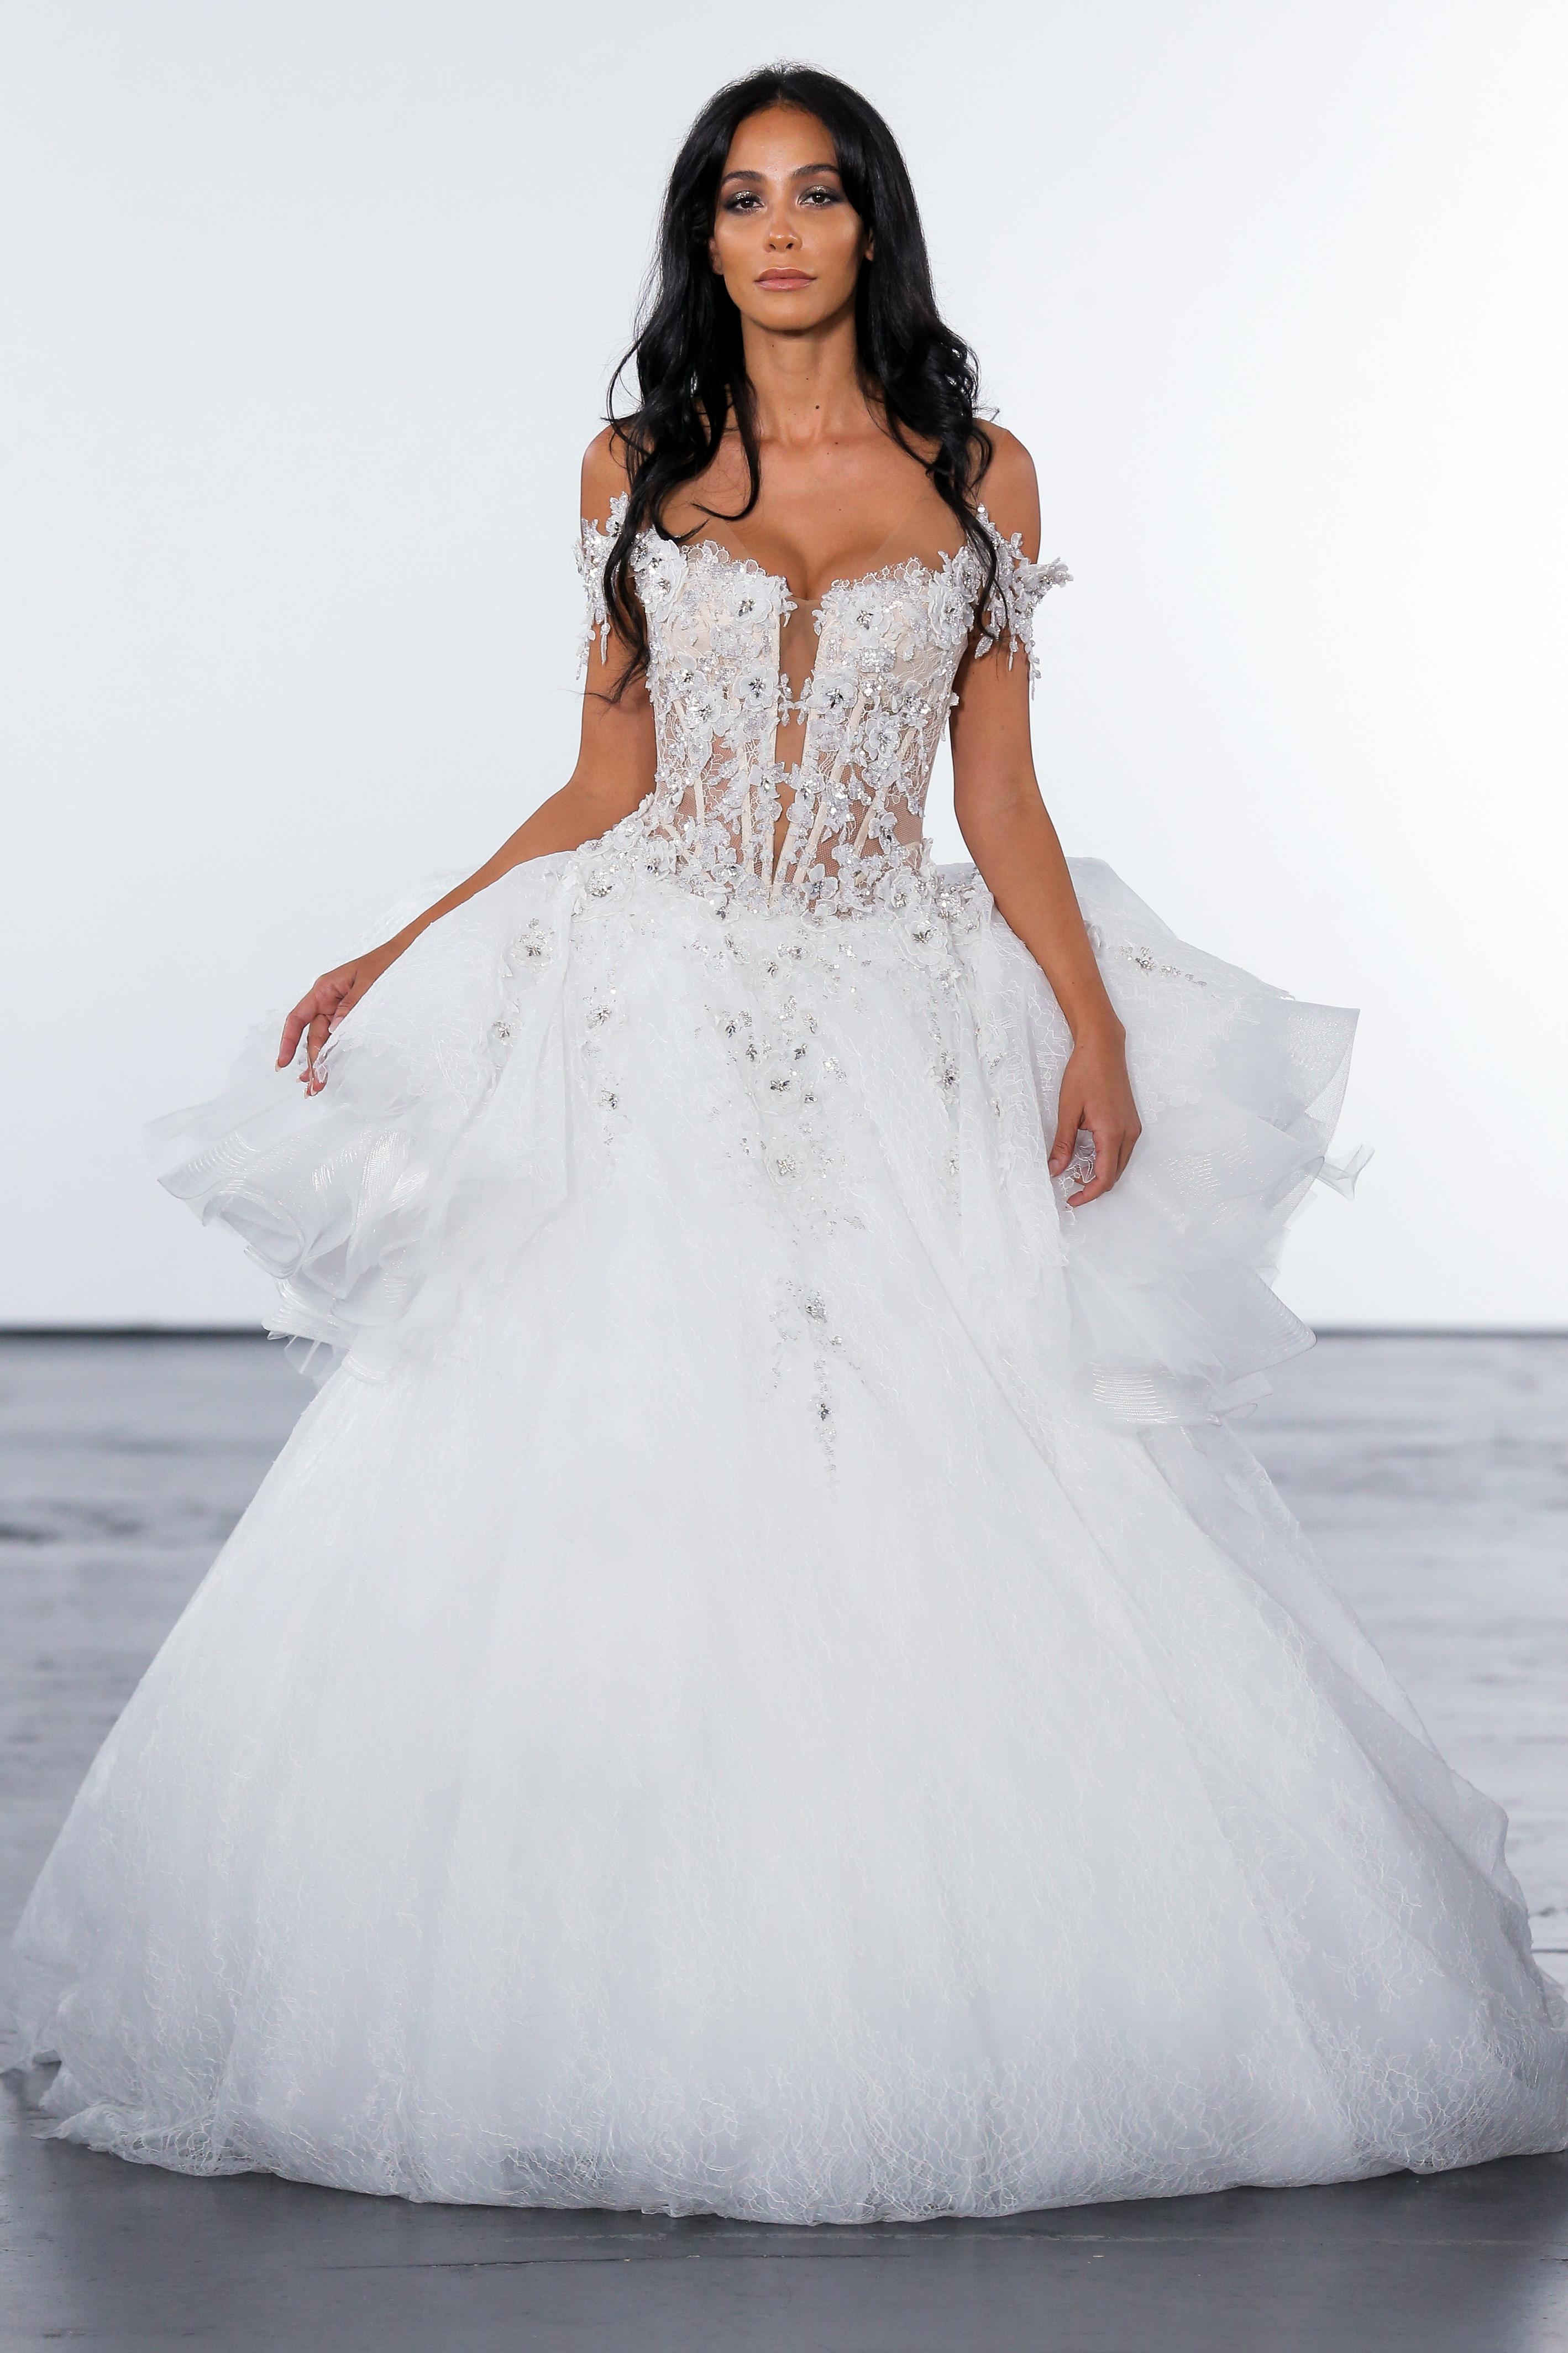 pnina tornai fall 2018 off shoulder wedding ballgown